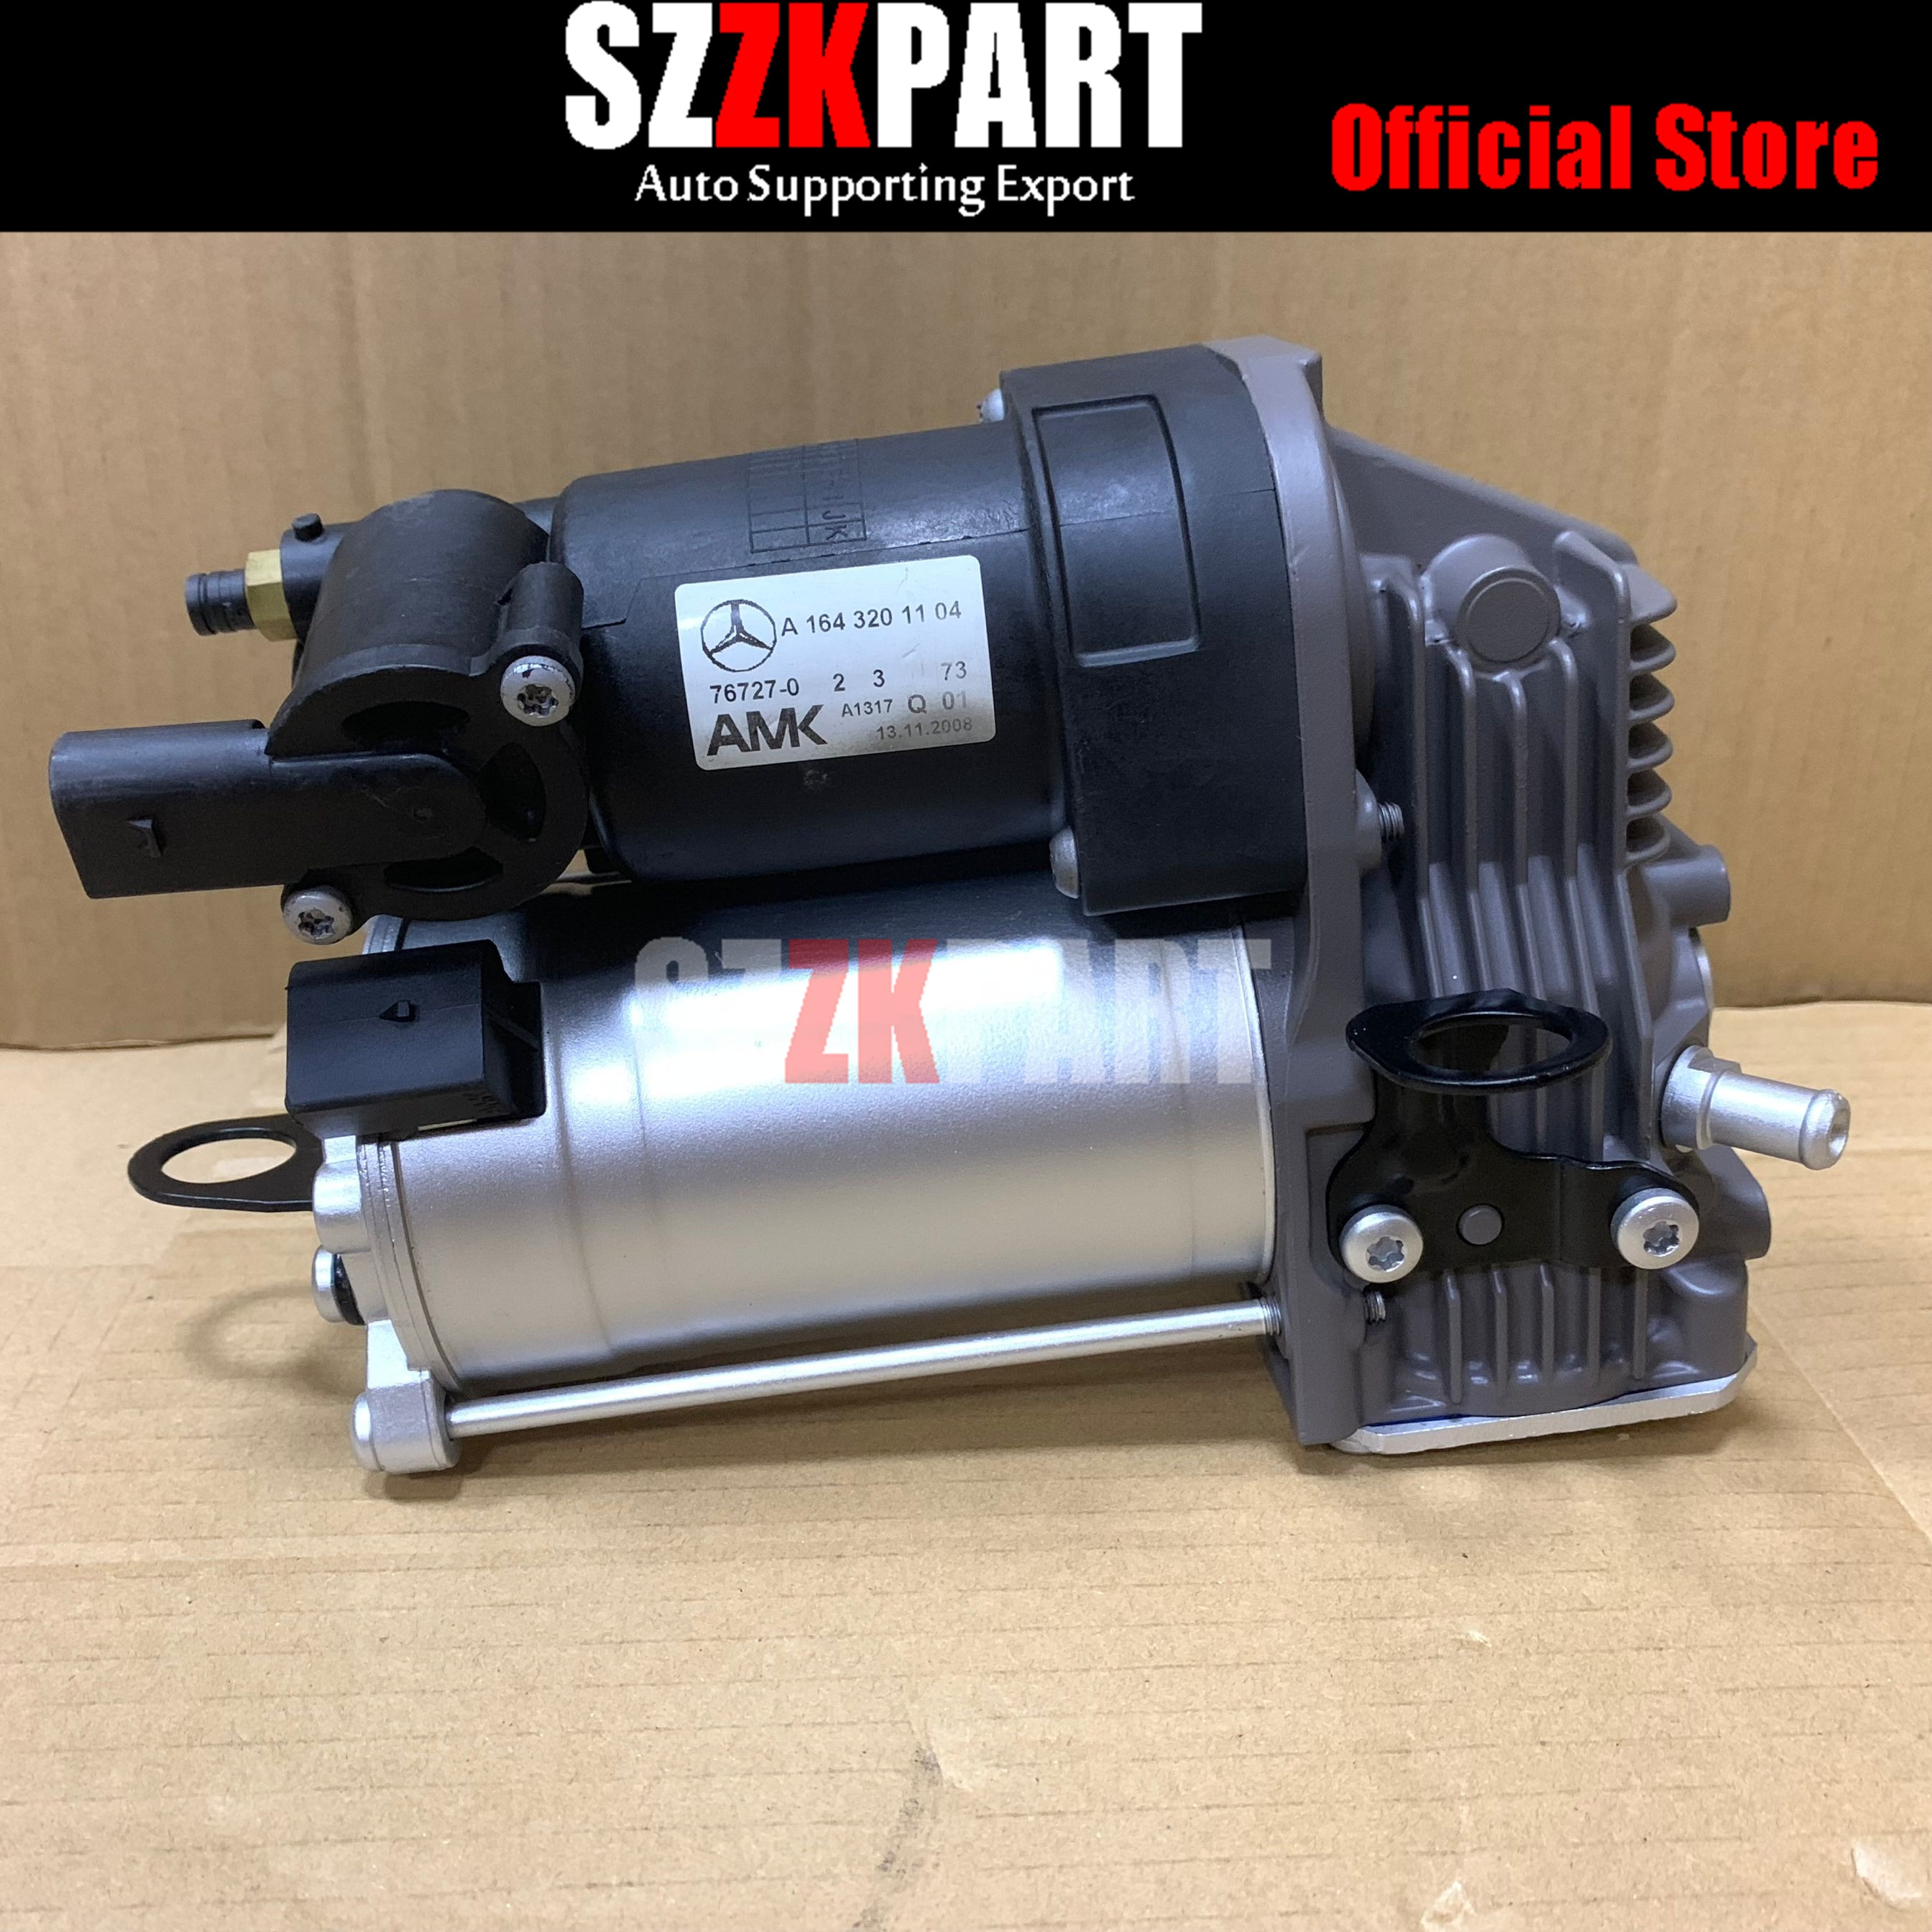 AP02 Air Ride Suspension Compressor Pump For Mercedes-Benz GL X164 ML W164 1643200304 1643200504 1643200904 A1643200504